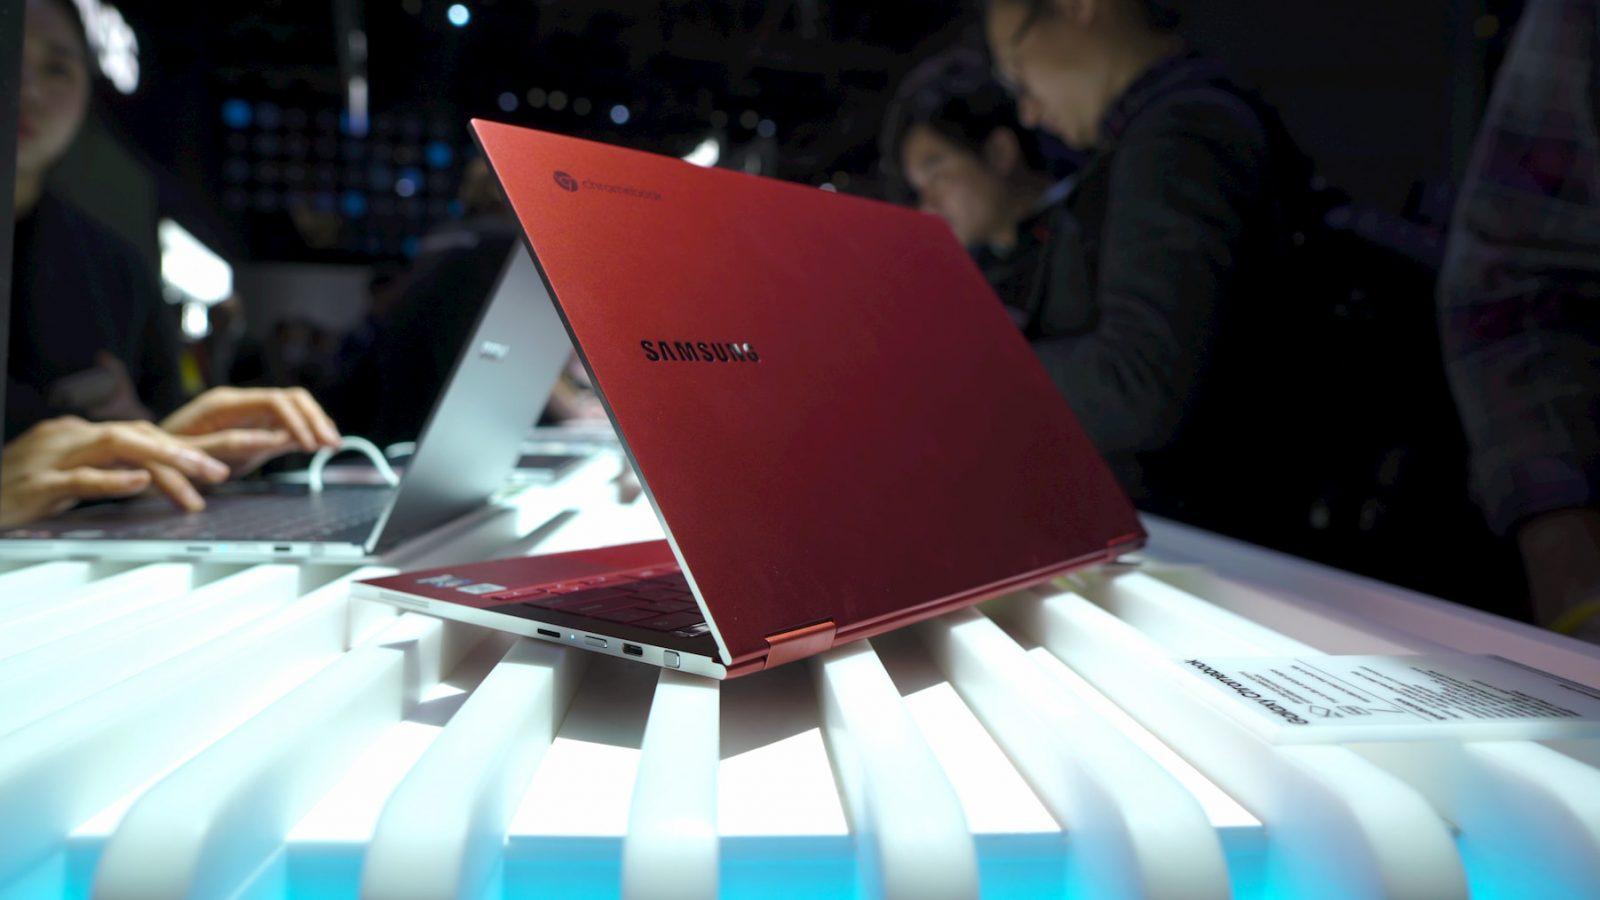 Начался приём предзаказов на ноутбук 2-в-1 Samsung Galaxy Chromebook 2 ()